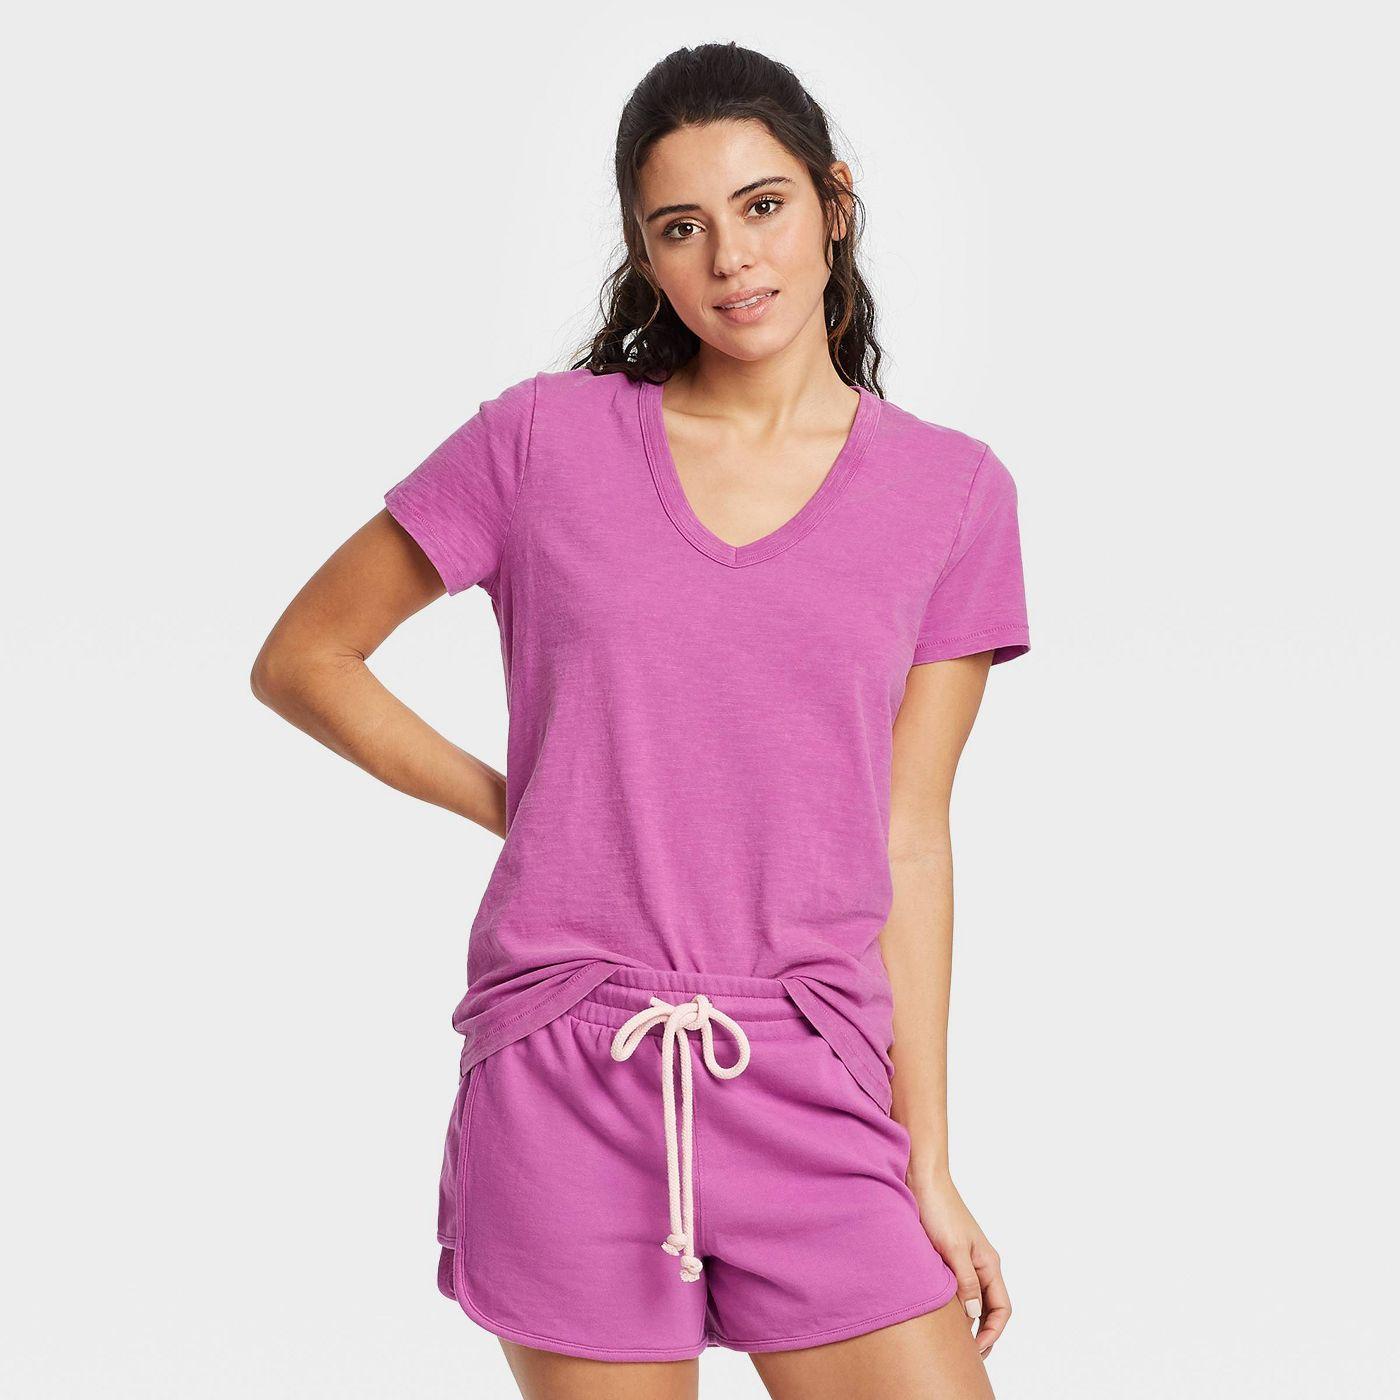 Women's Short Sleeve V-Neck T-Shirt - Universal Thread™ - image 1 of 8